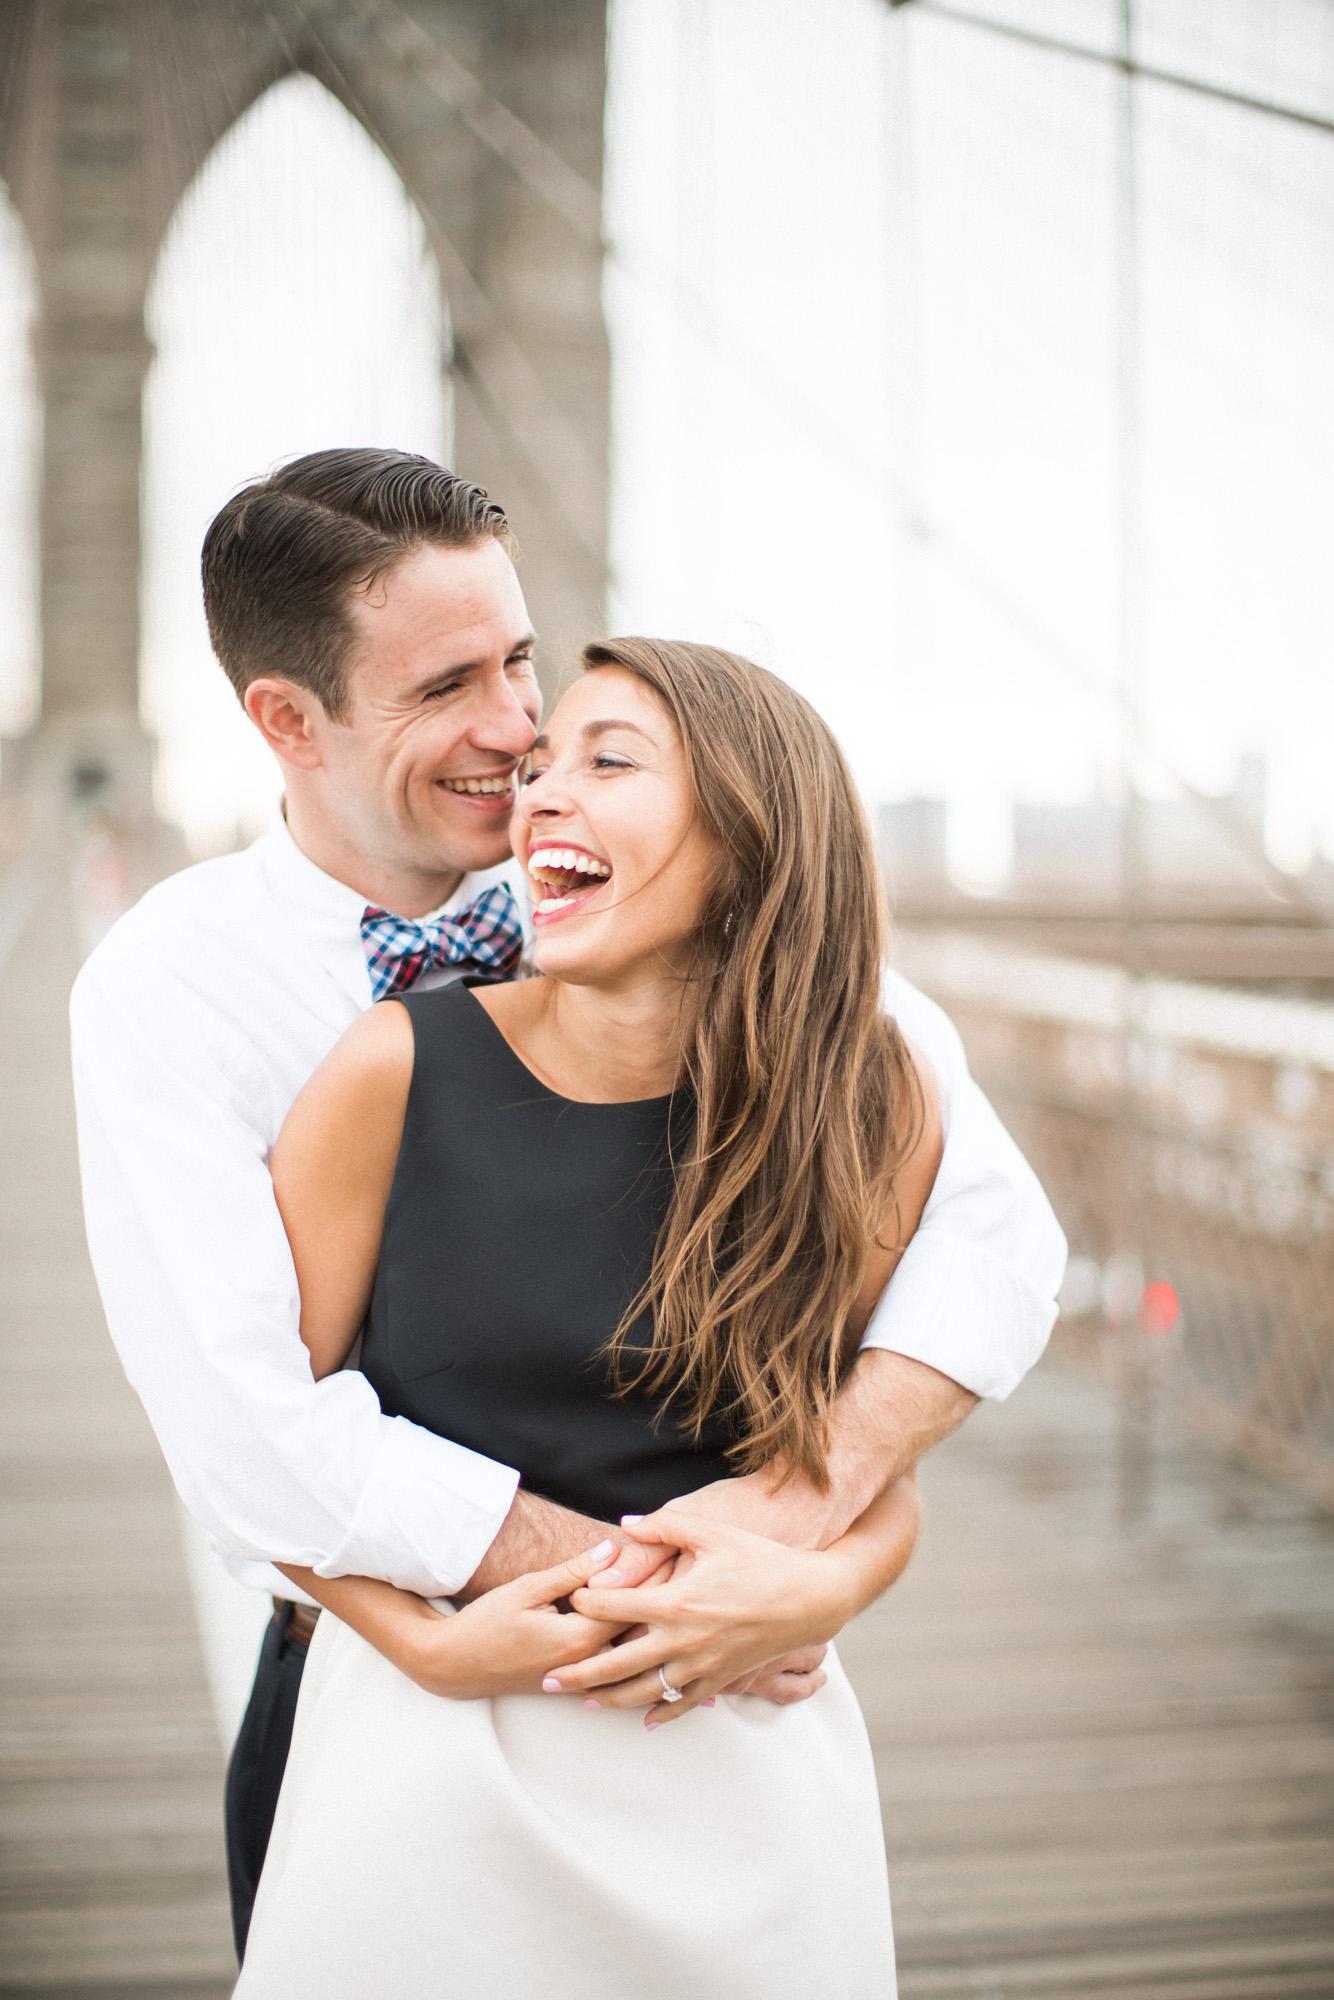 new-york-city-wedding-photography-hunter-ryan-photo-04761.jpg